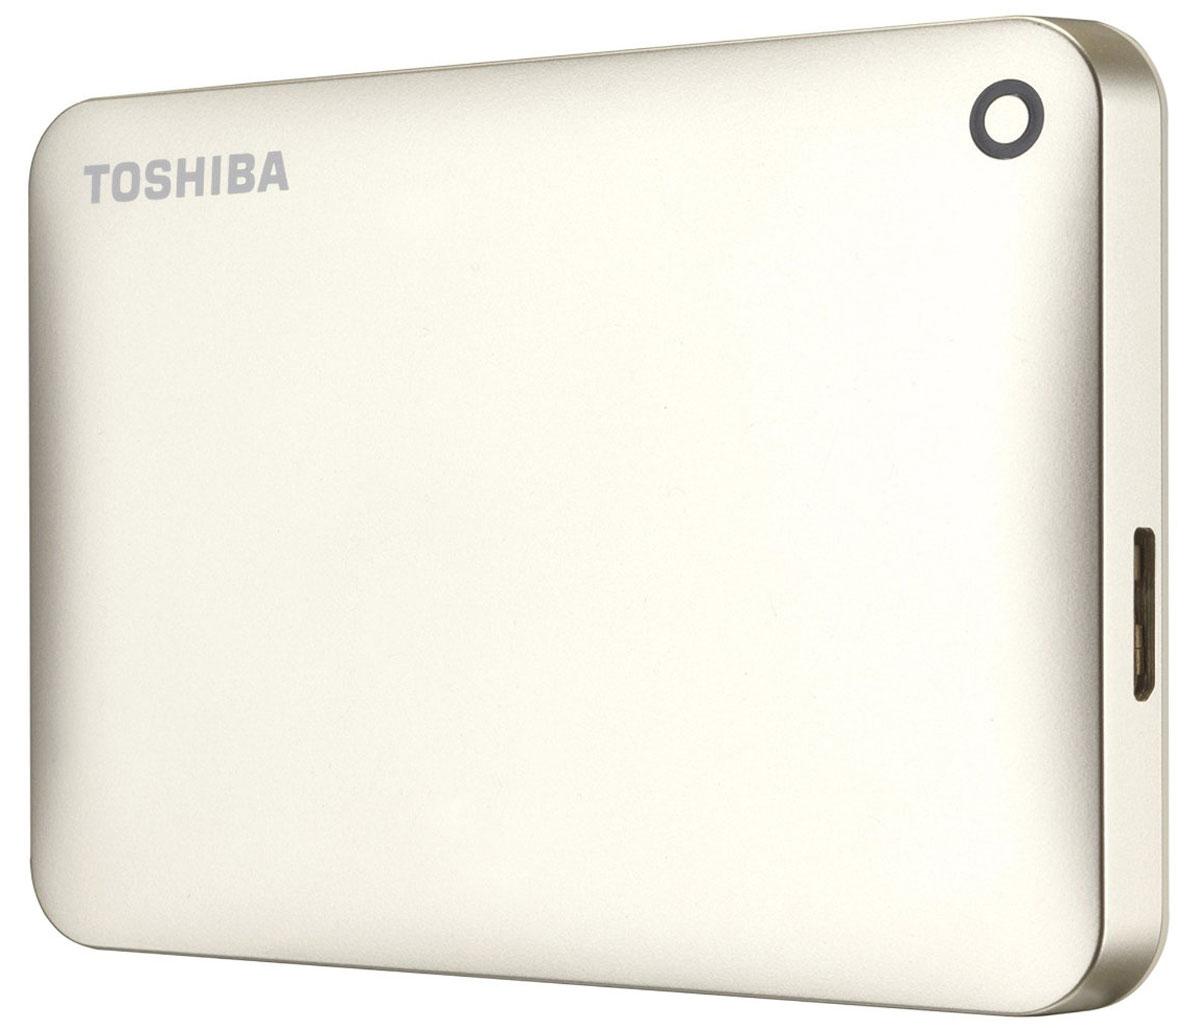 Toshiba Canvio Connect II 1TB, Gold внешний жесткий диск (HDTC810EC3AA)